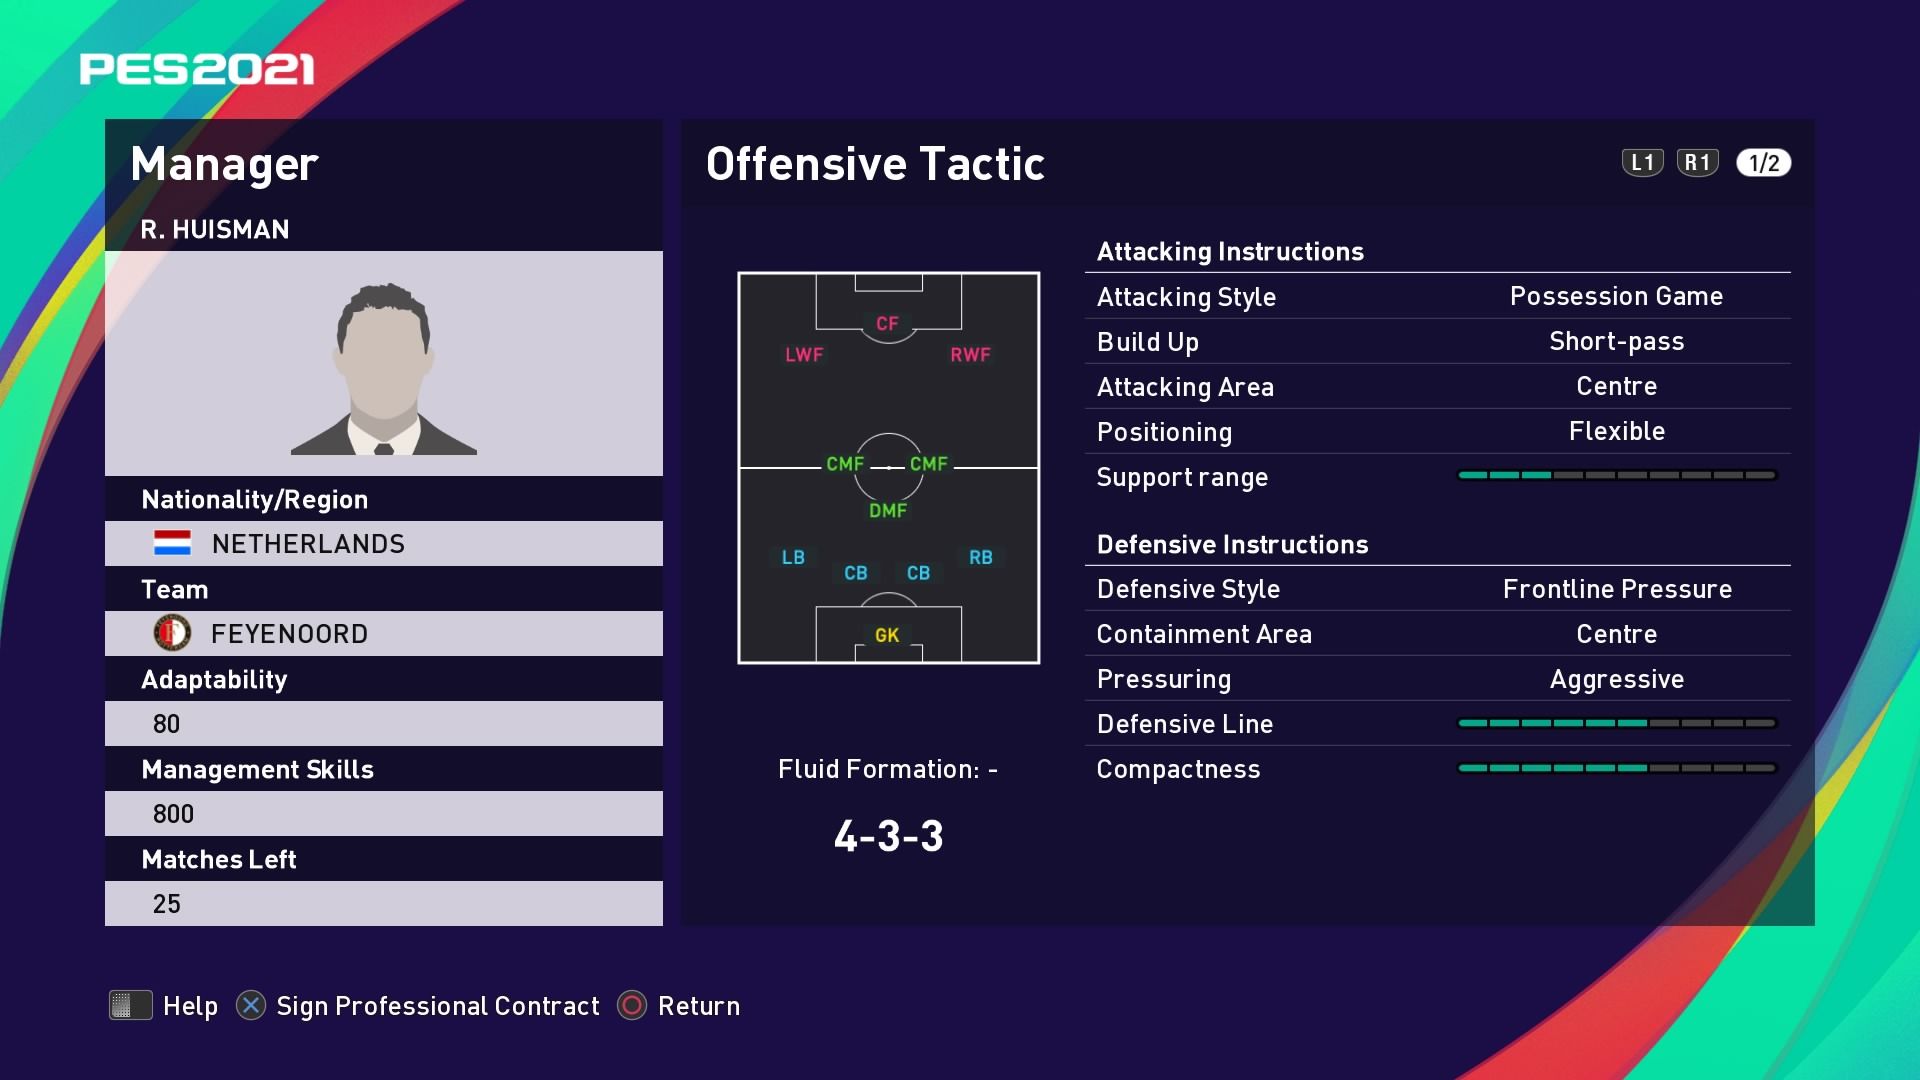 R. Huisman (Dick Advocaat) Offensive Tactic in PES 2021 myClub